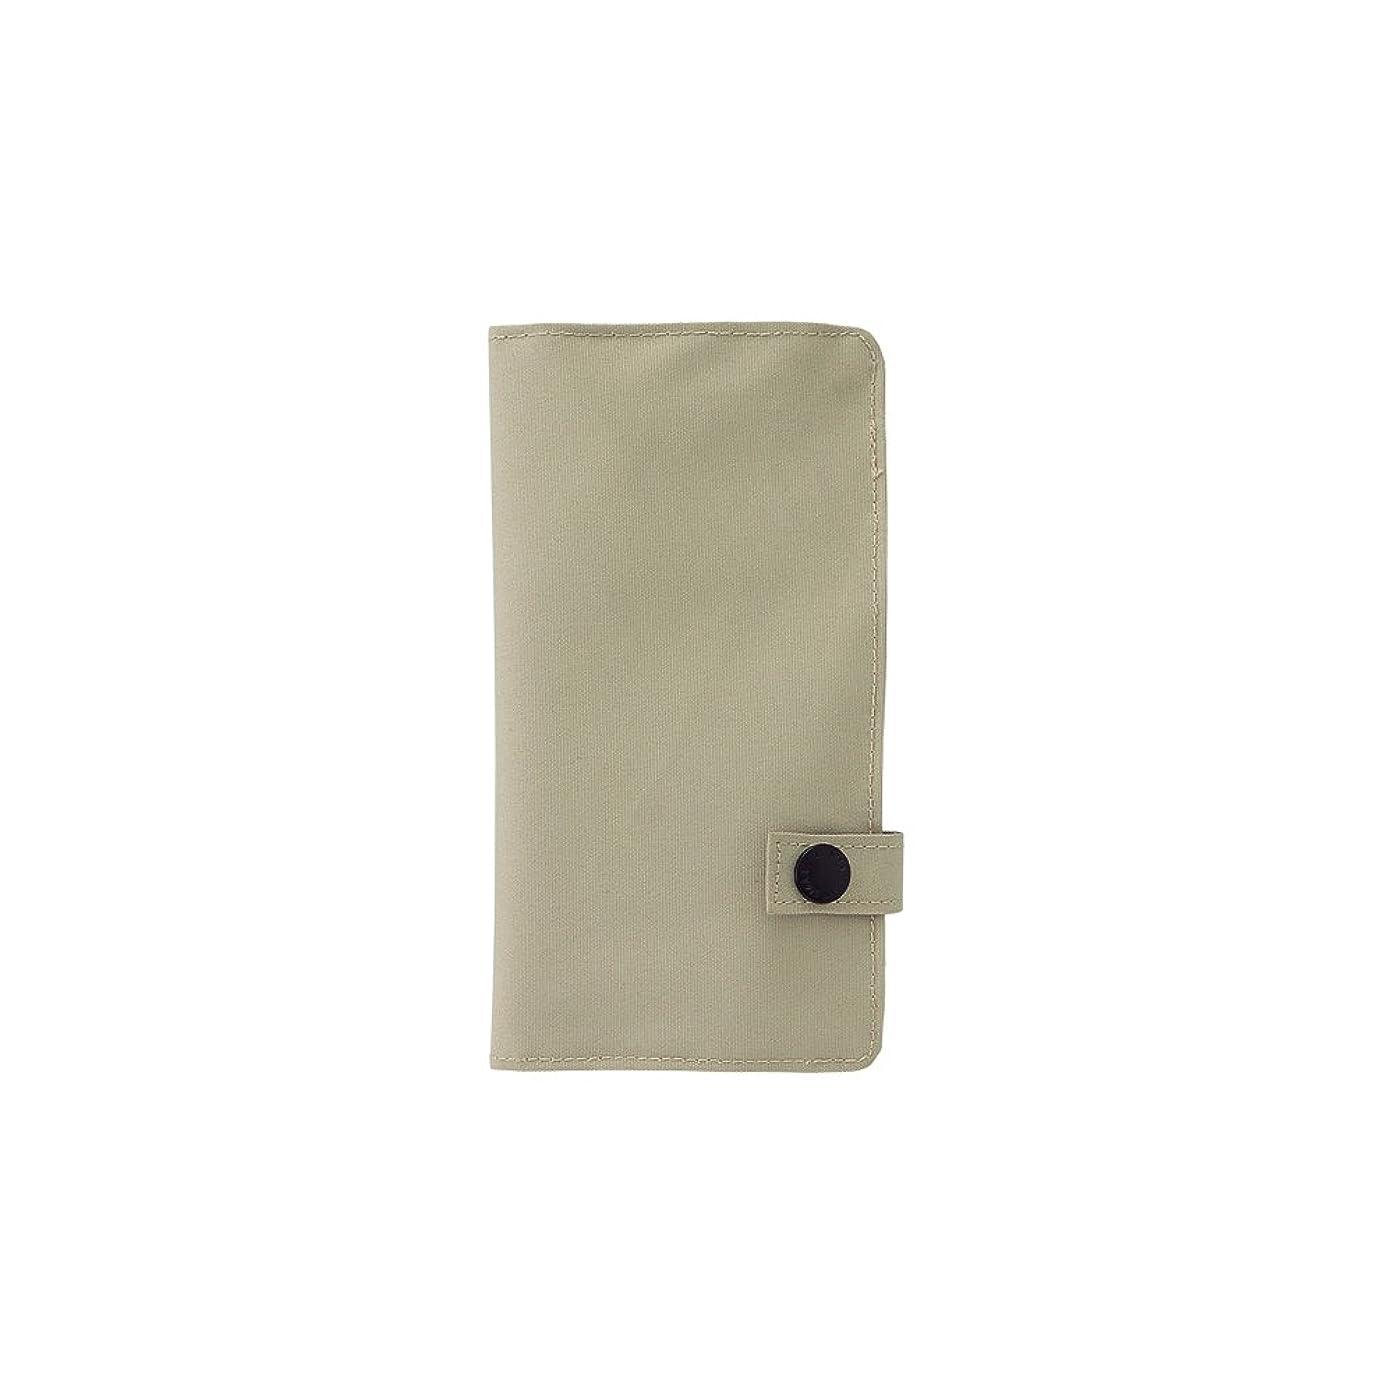 LIHIT LAB. Slim Pen Case, Beige, 7.5 x 4.3